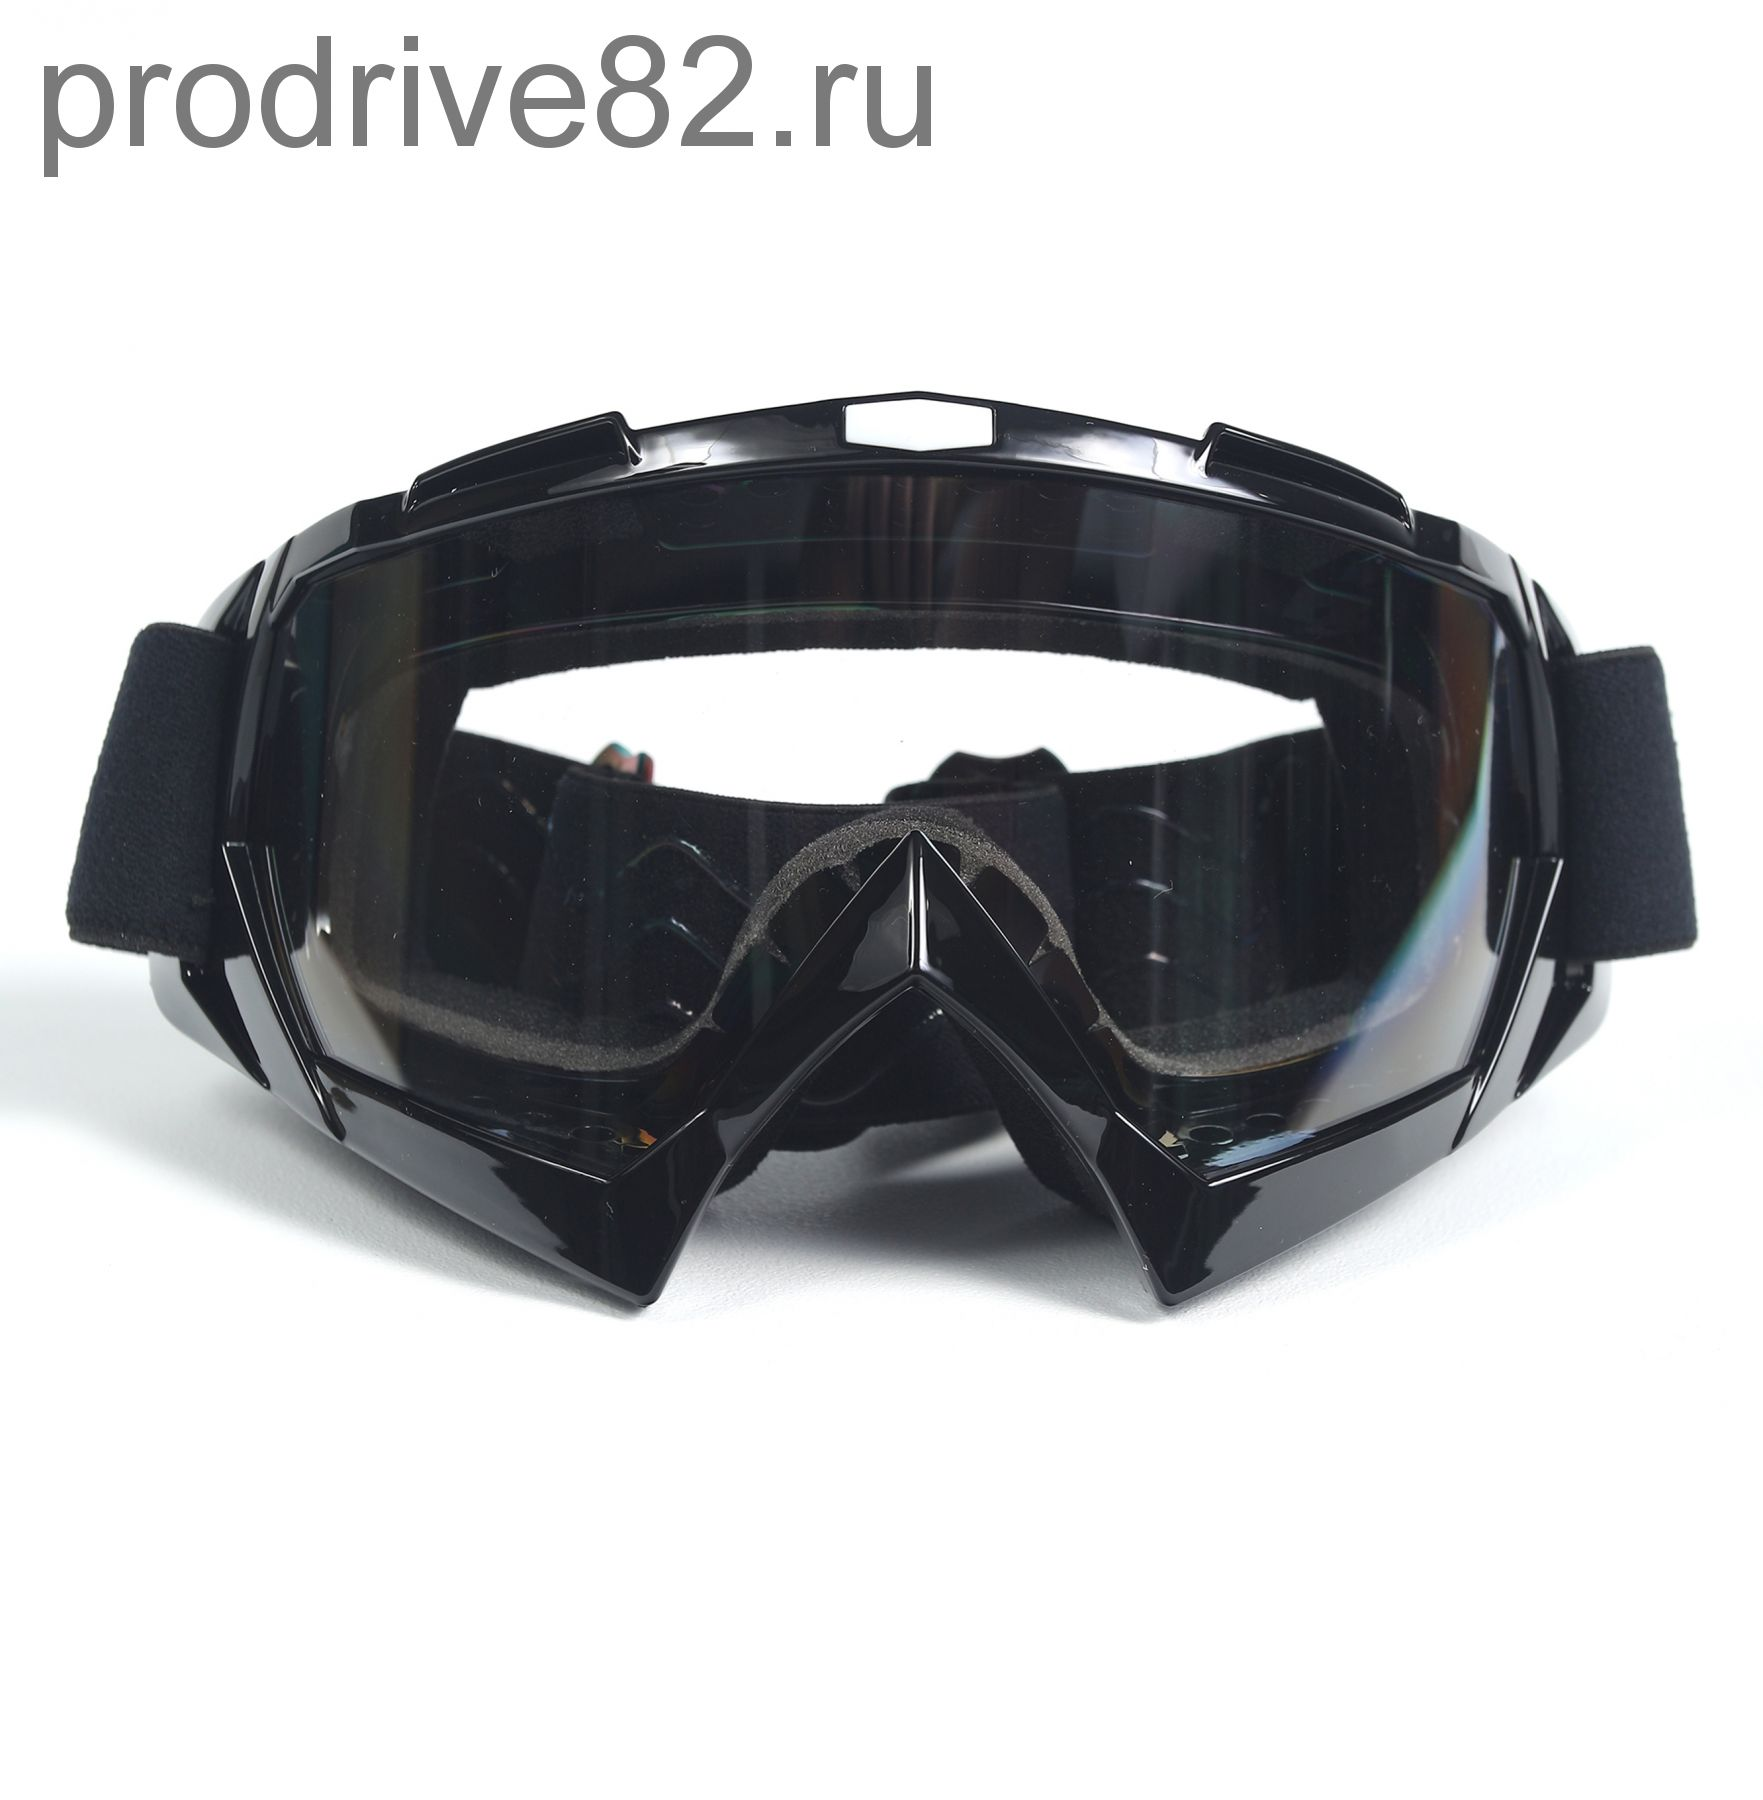 Мото очки М004 Black